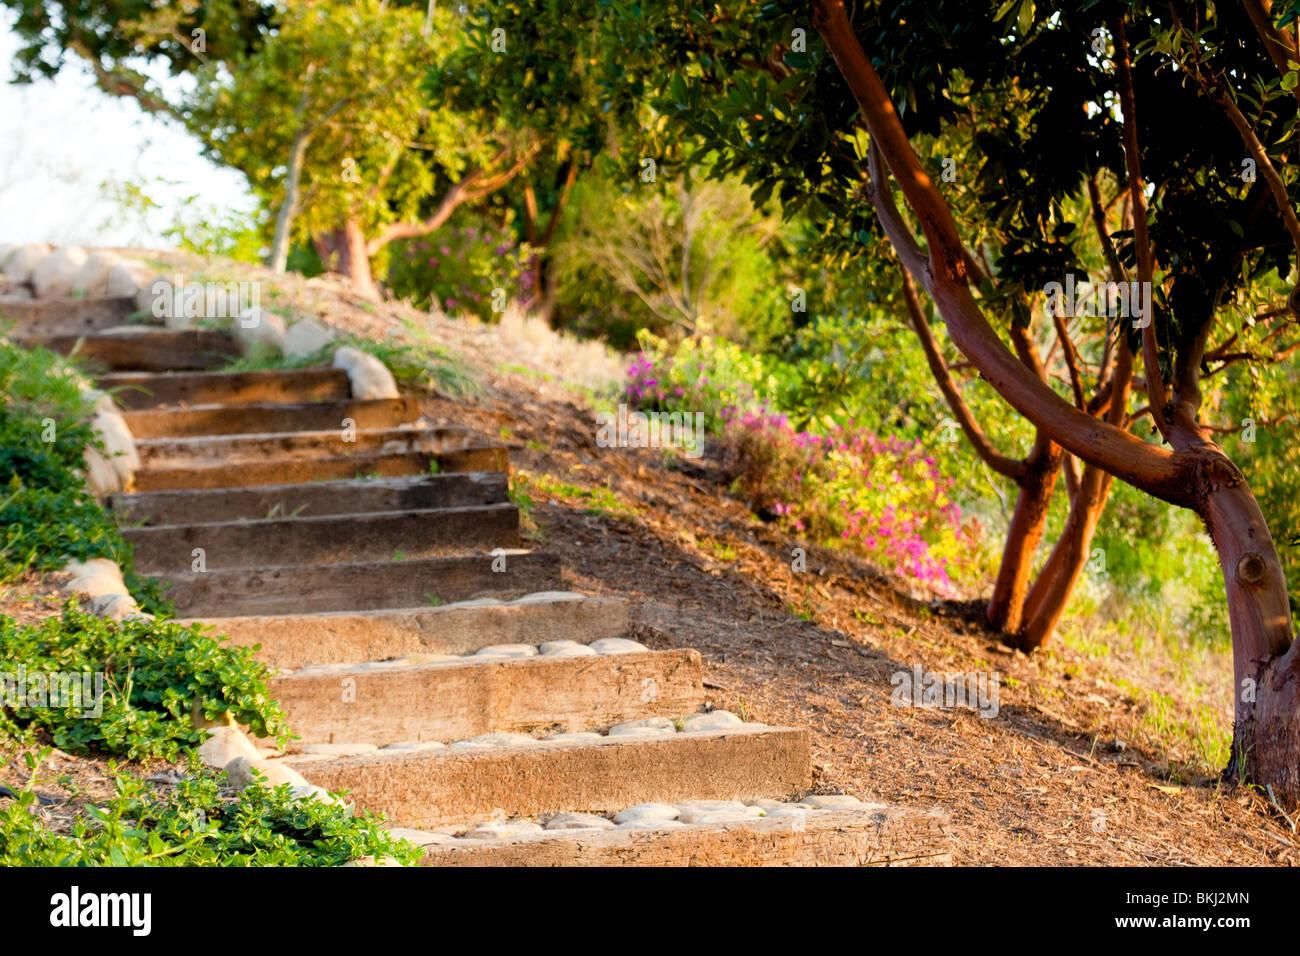 Outdoor Steps Outdoor Steps Park Mulch Stone Landscape Pink Flower Natural